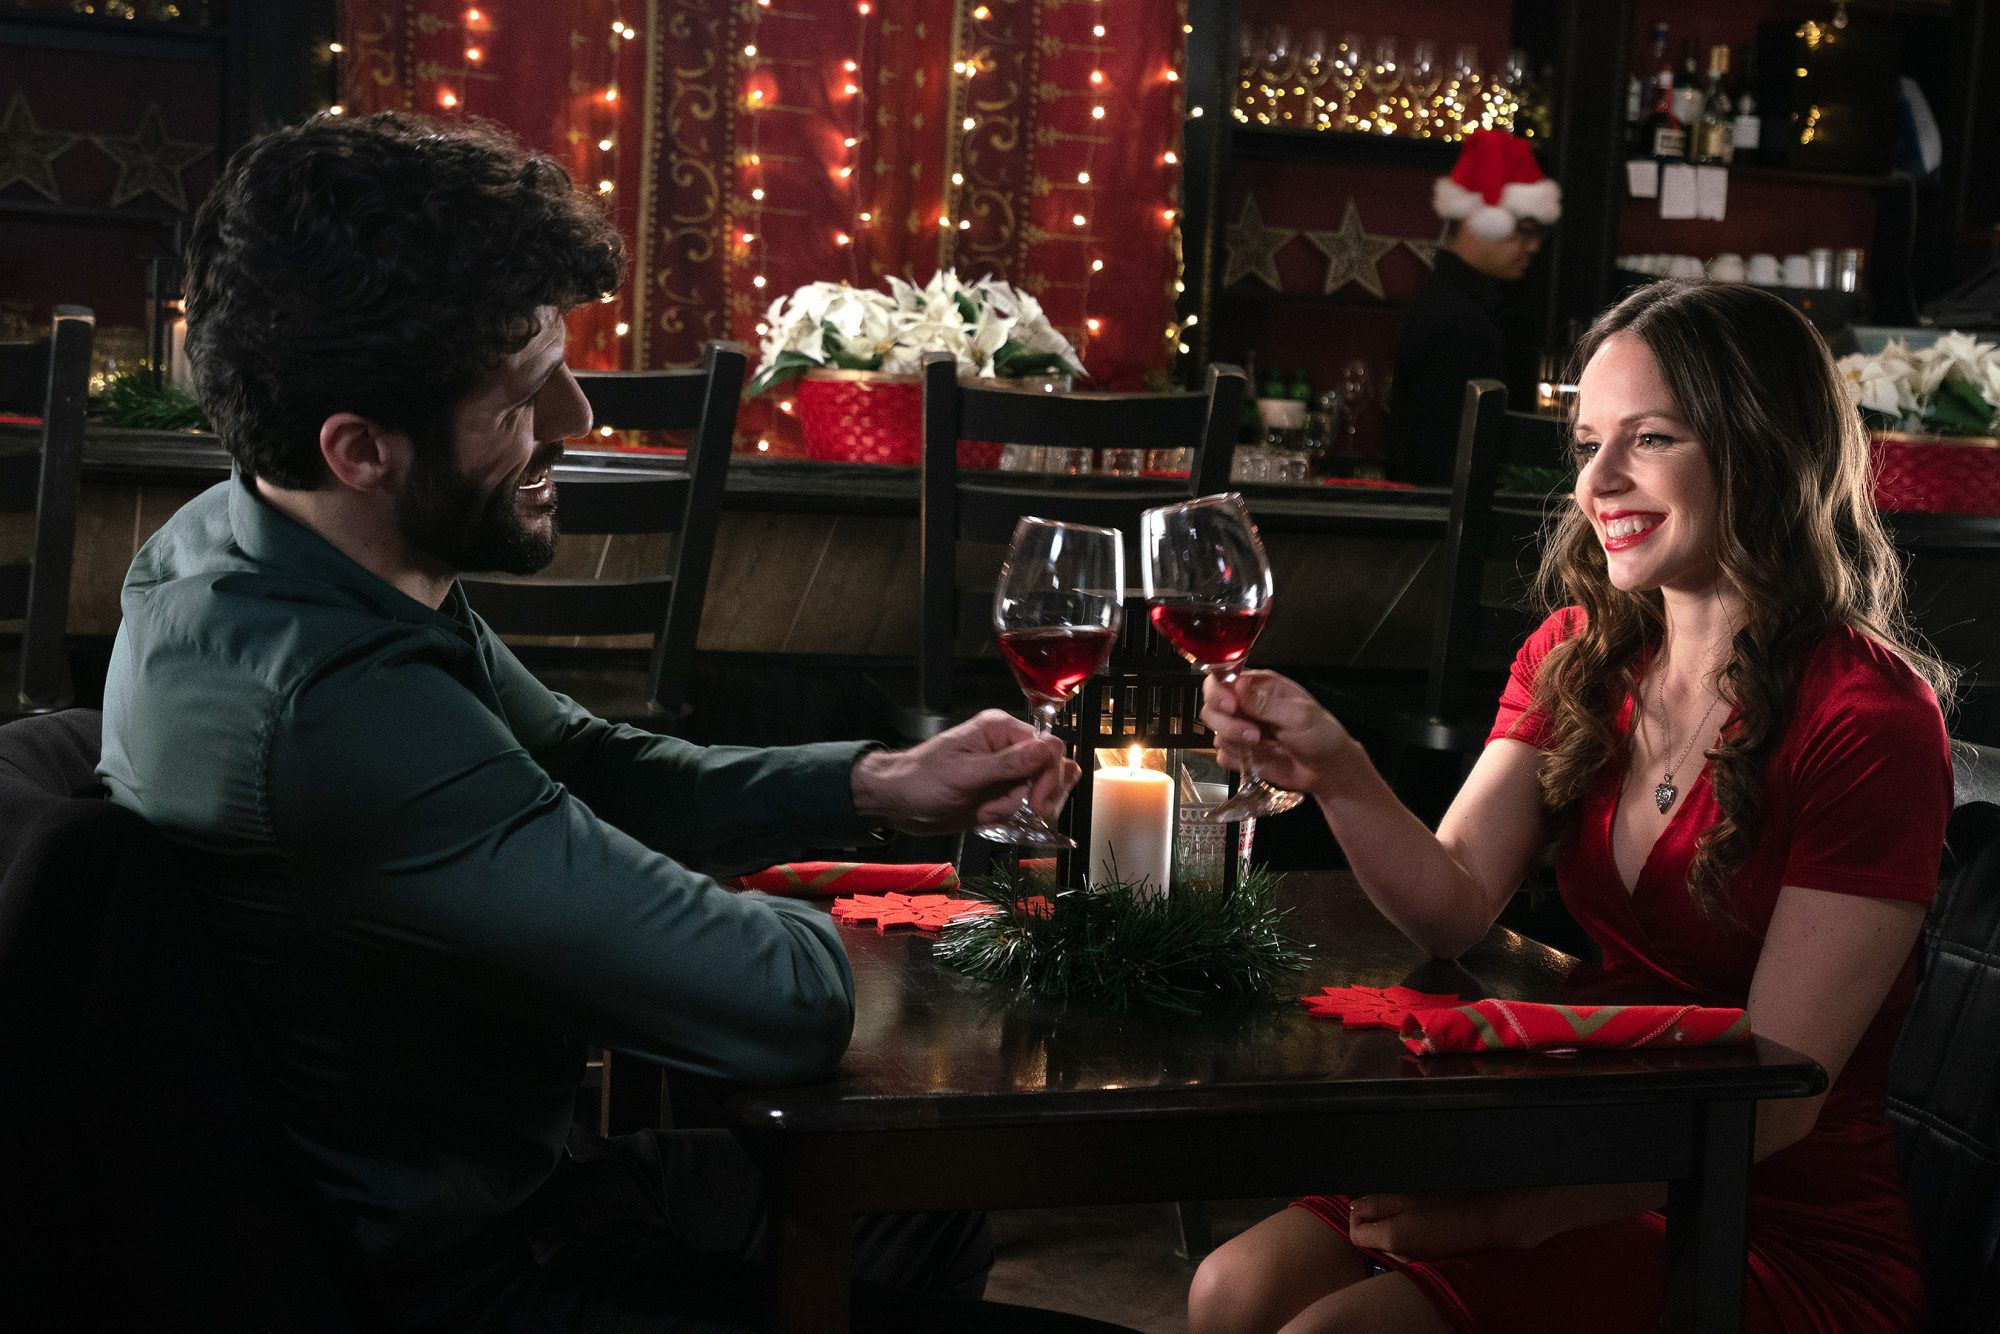 Chrismas Catch UPTV Christmas moviesCredit: UPTV